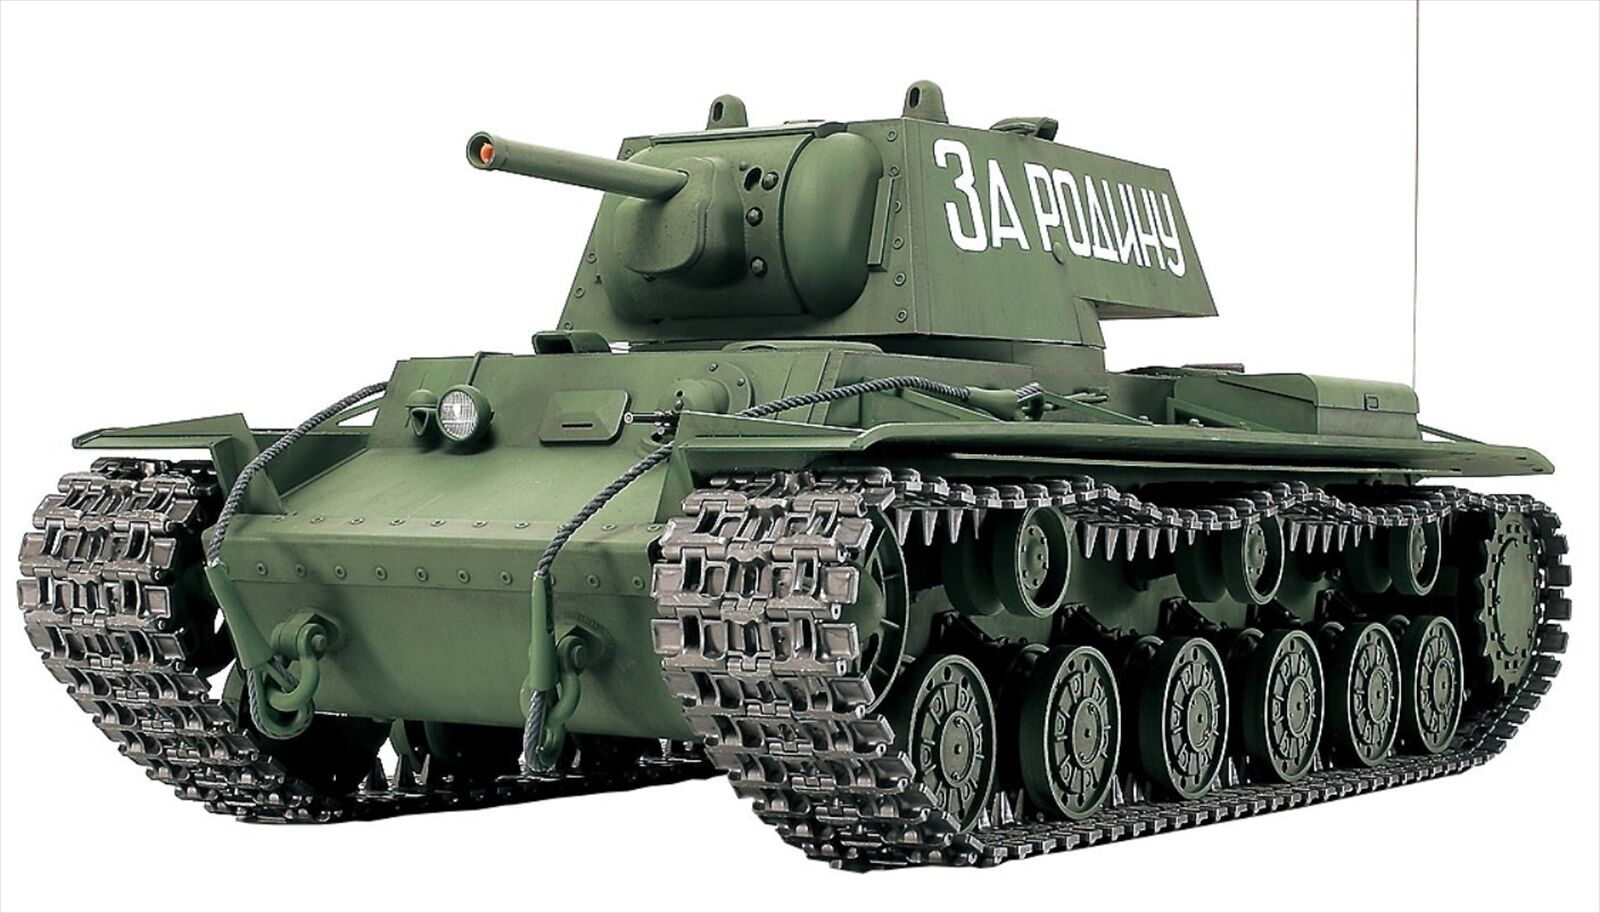 Tamiya 1 16 Radio Control No.27 Soviet KV-1 Heavy Tank  Gigant Full Operation Set  solo per te